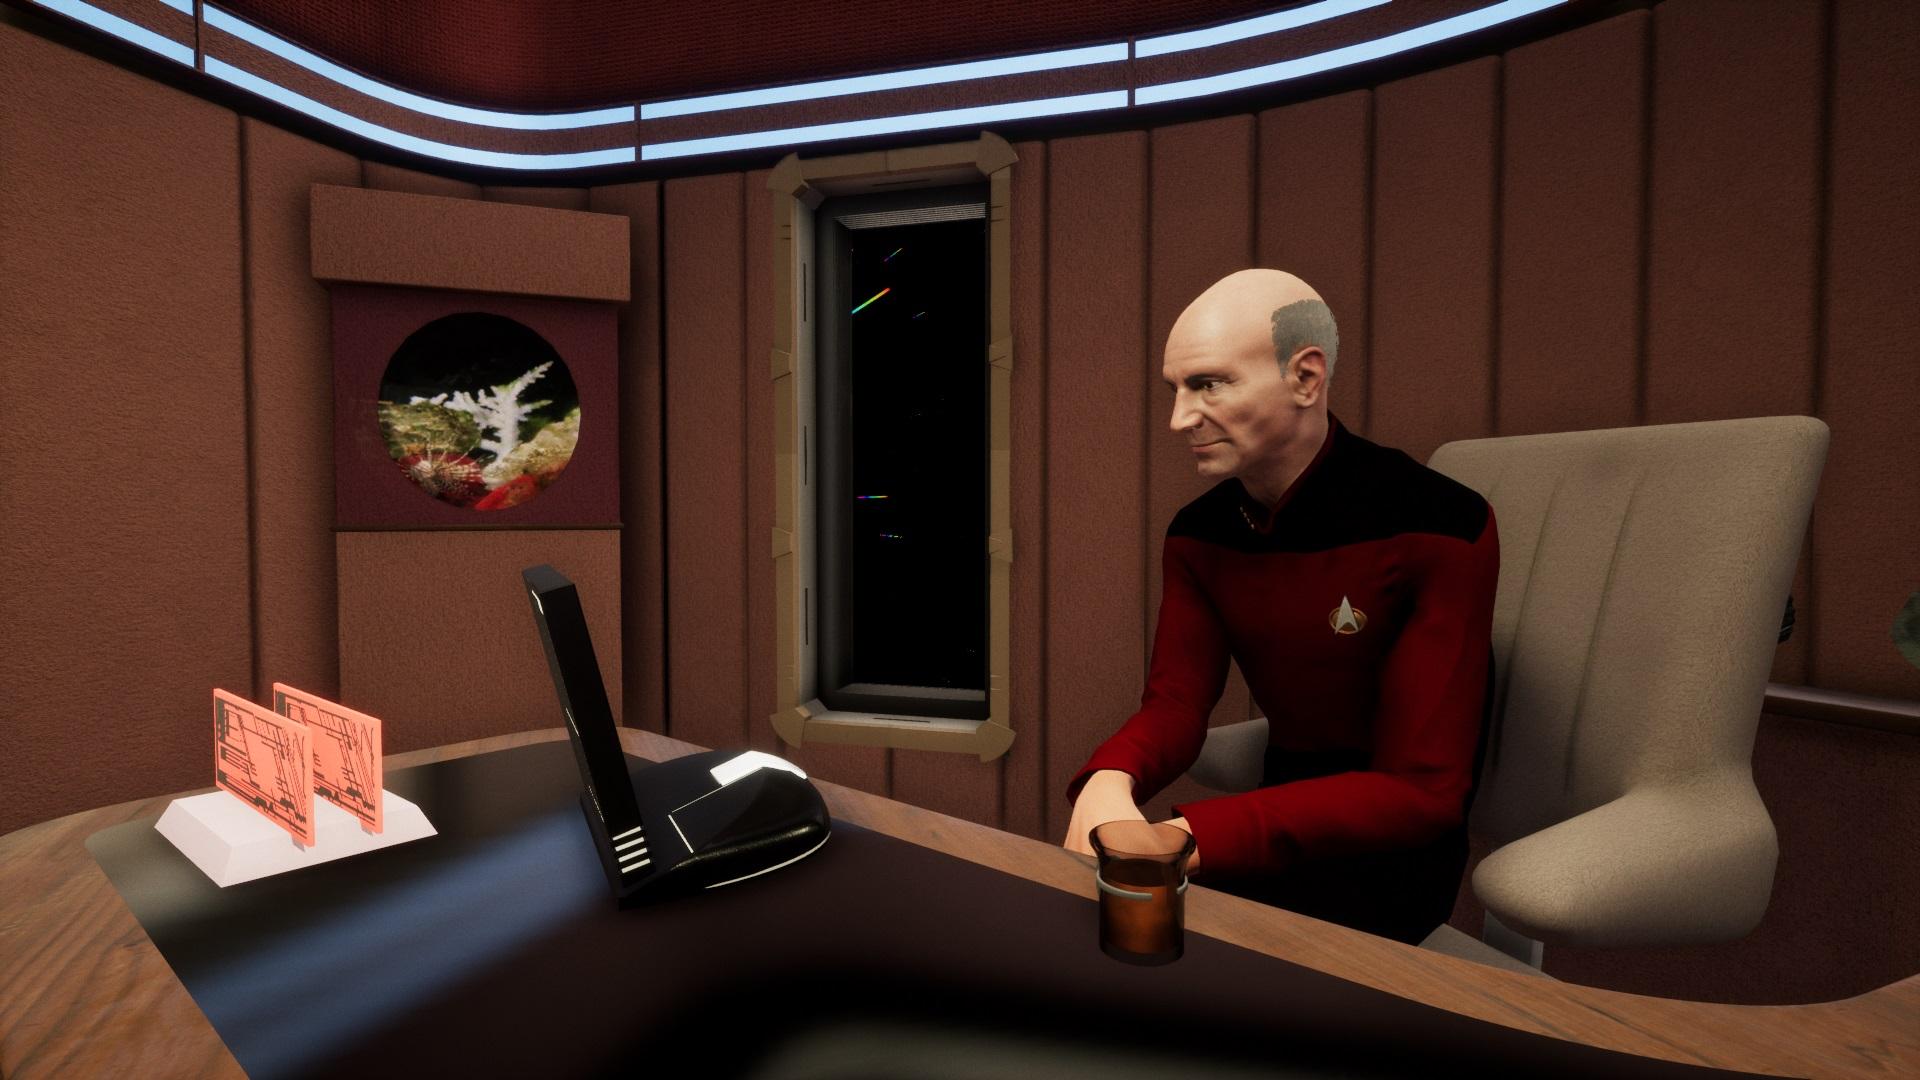 Stage 9 - Star Trek fan game